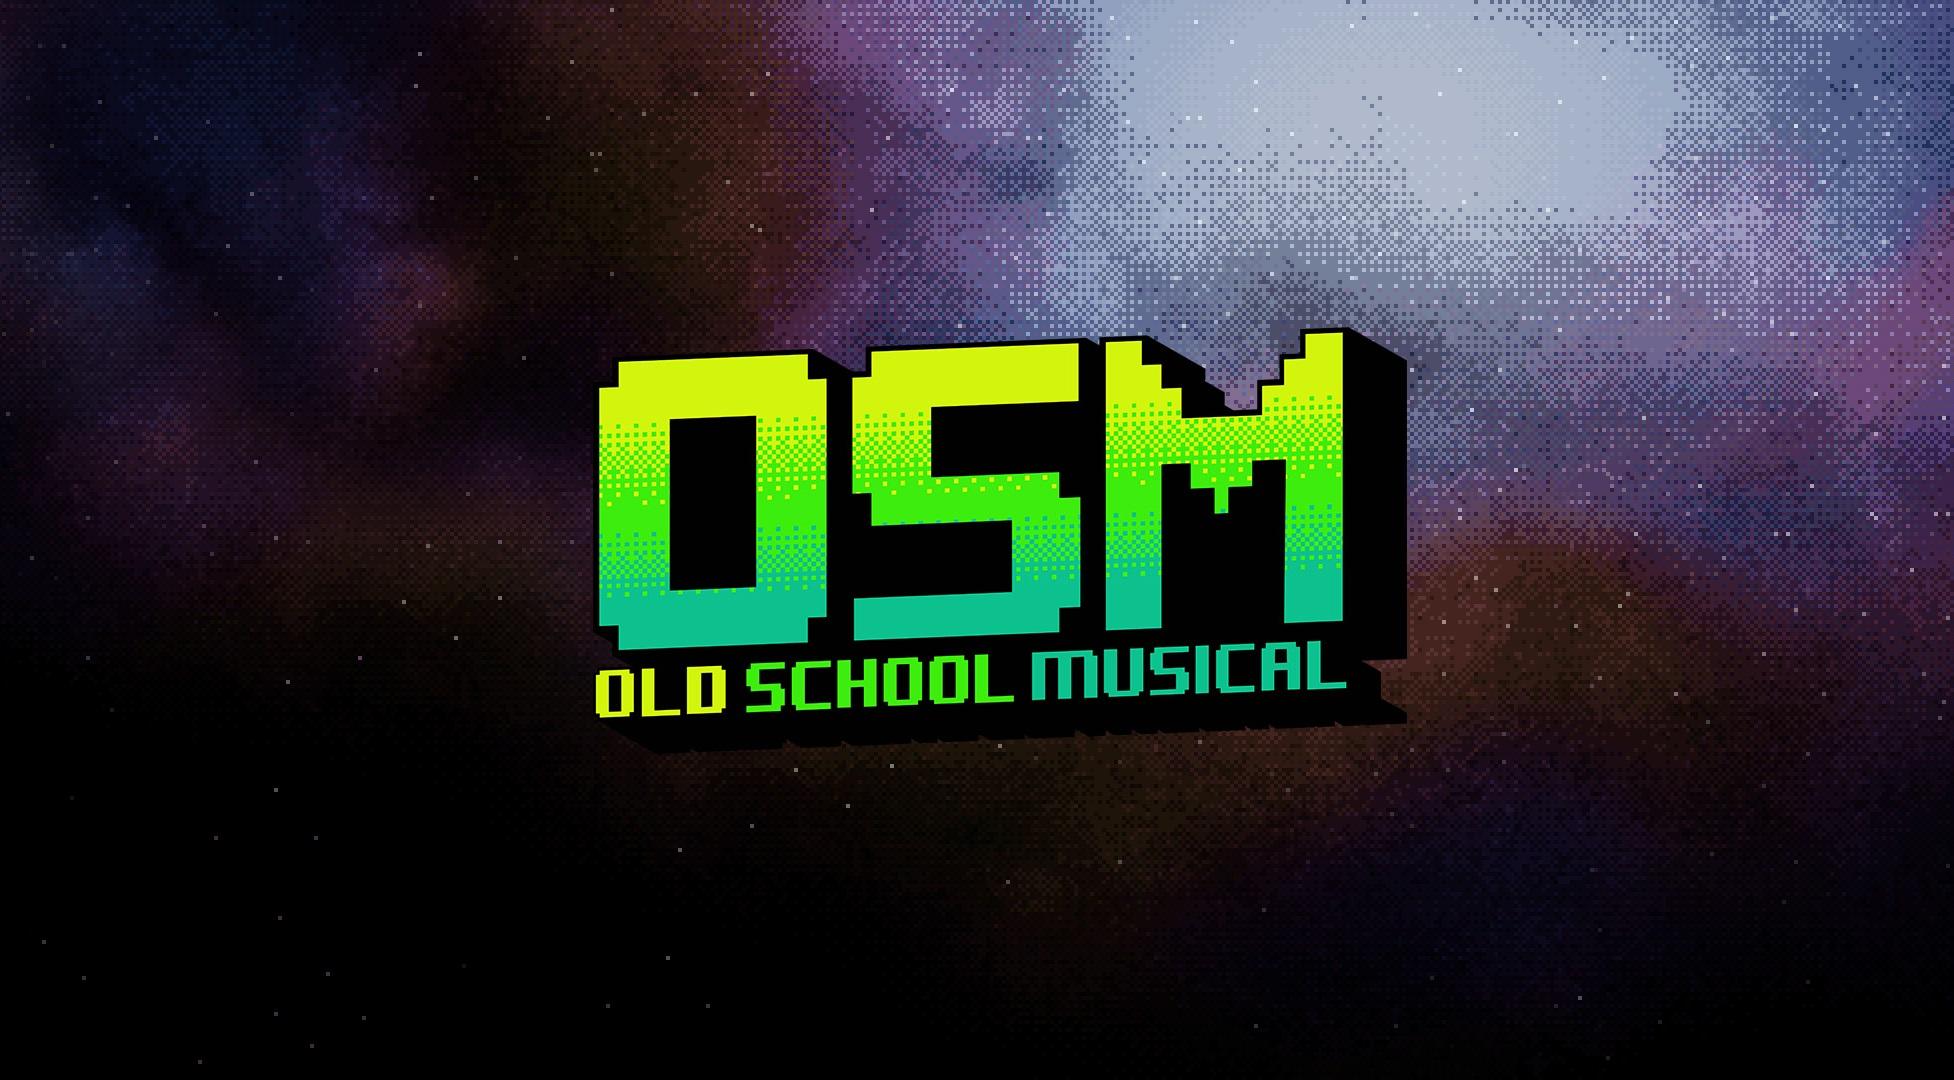 BlurryPhoenix Reflects: Old School Musical